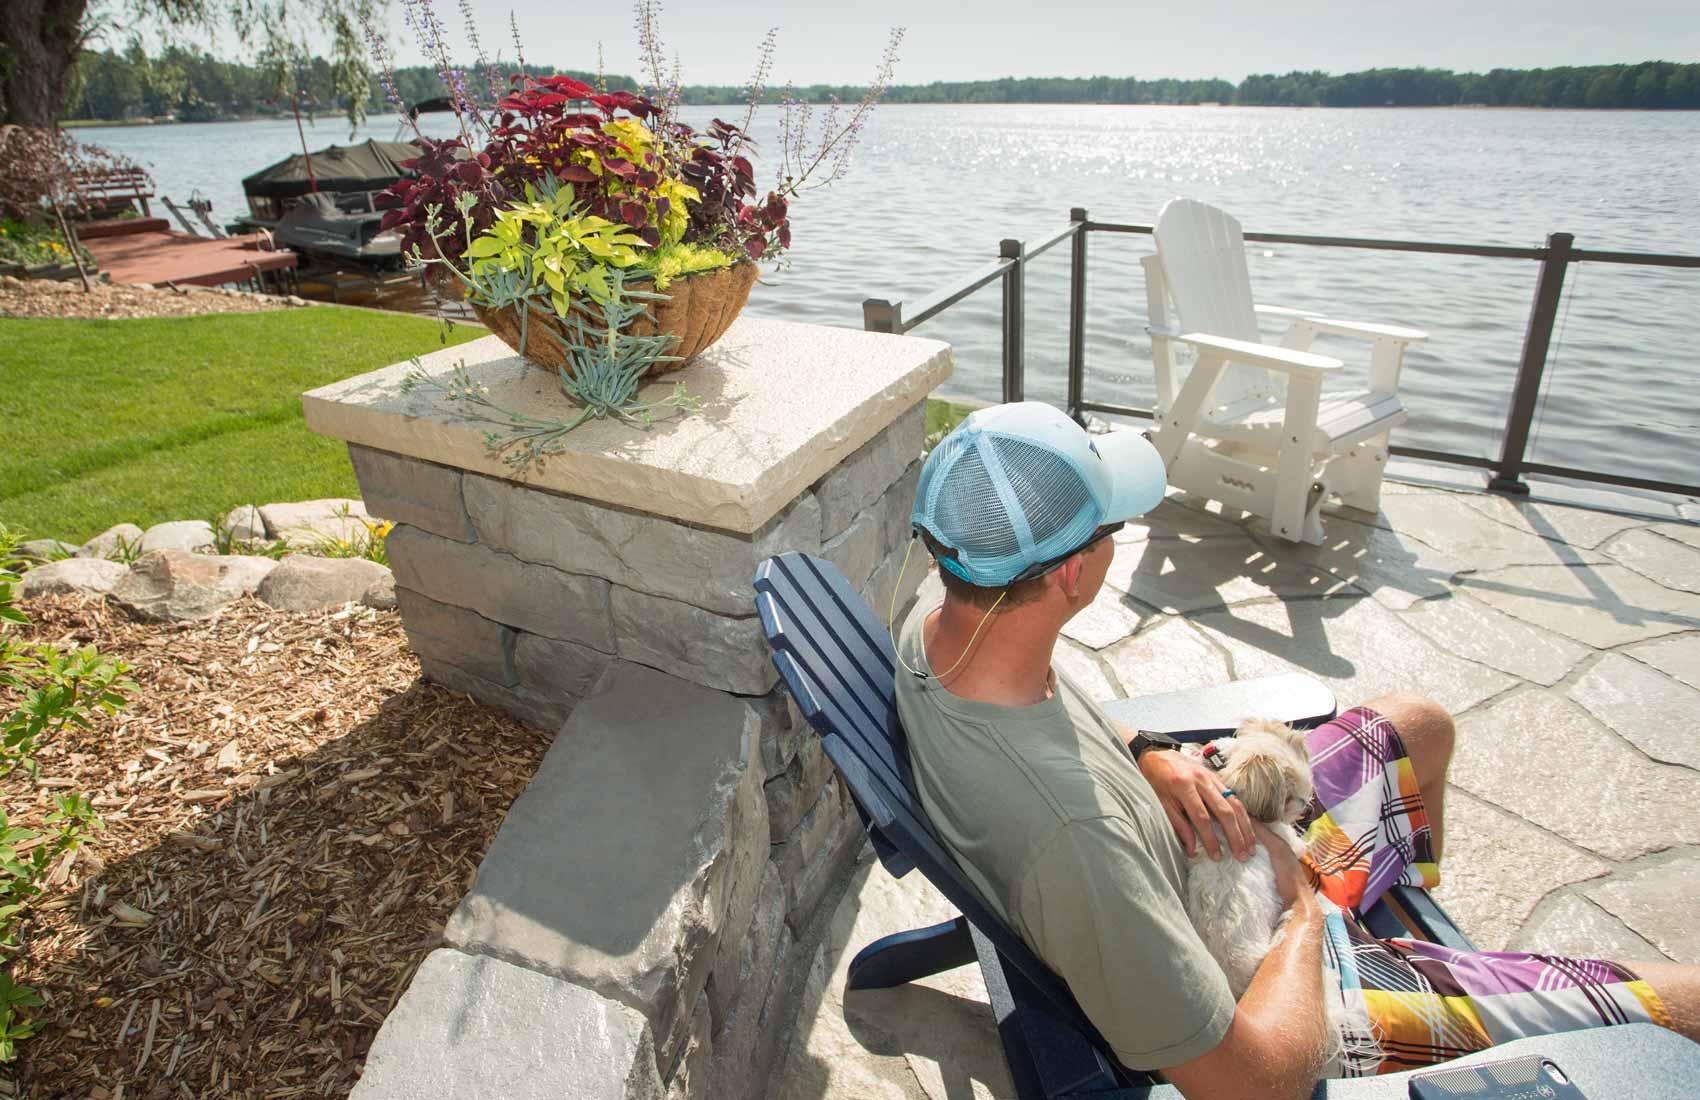 Man looking at lake next to Kodah wall and column with Grand Flagstone pavers